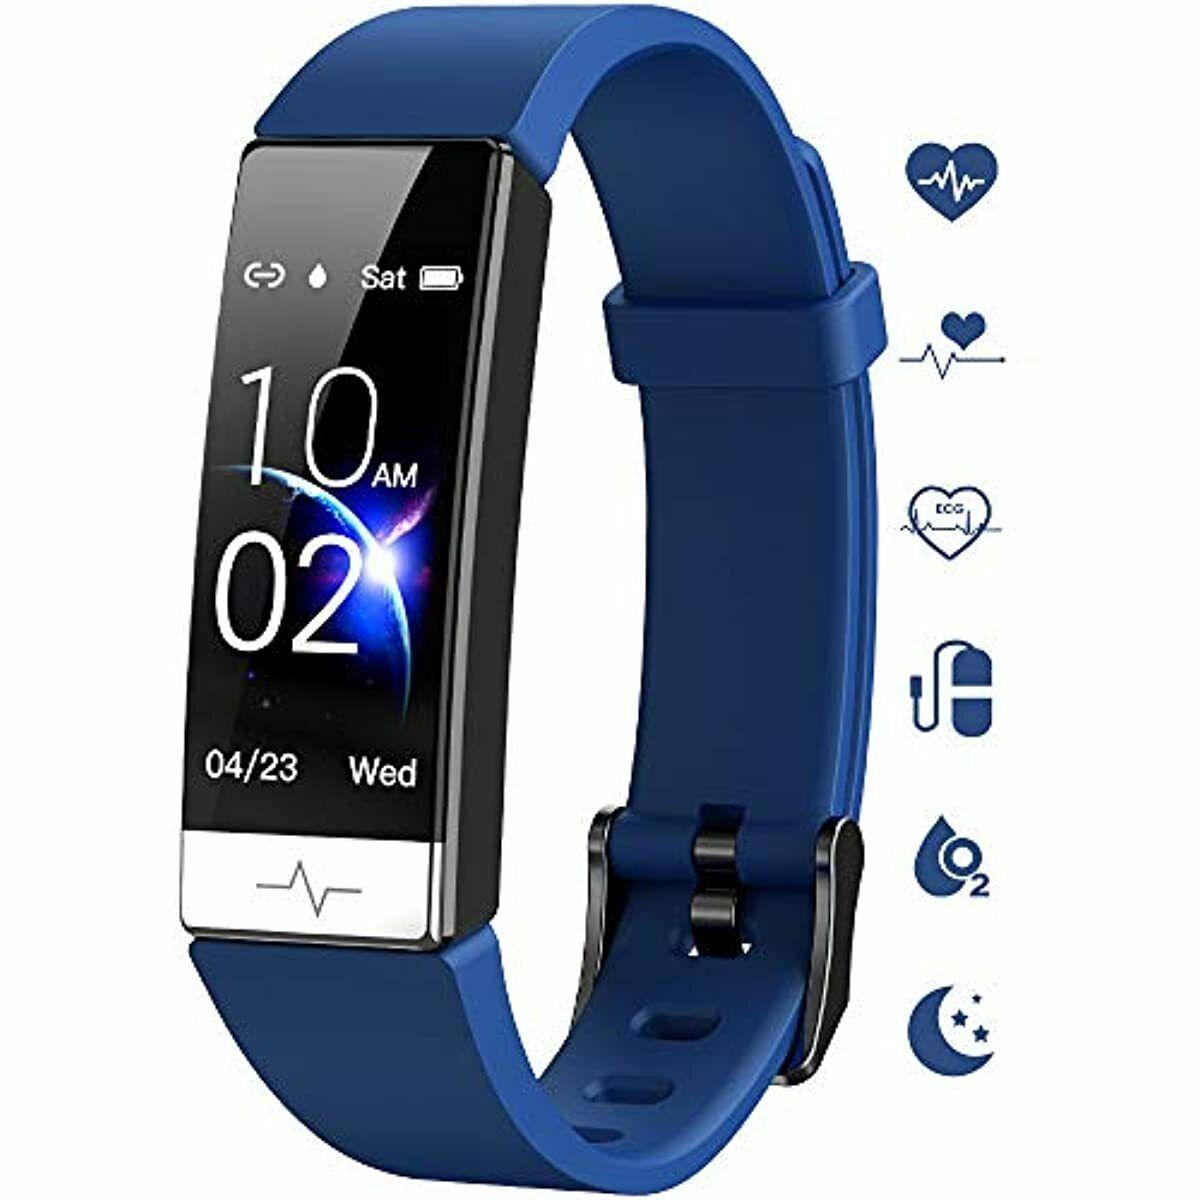 Fitness Tracker, Heart Rate Monitor IP68 Waterproof Activity Tracker HRV H